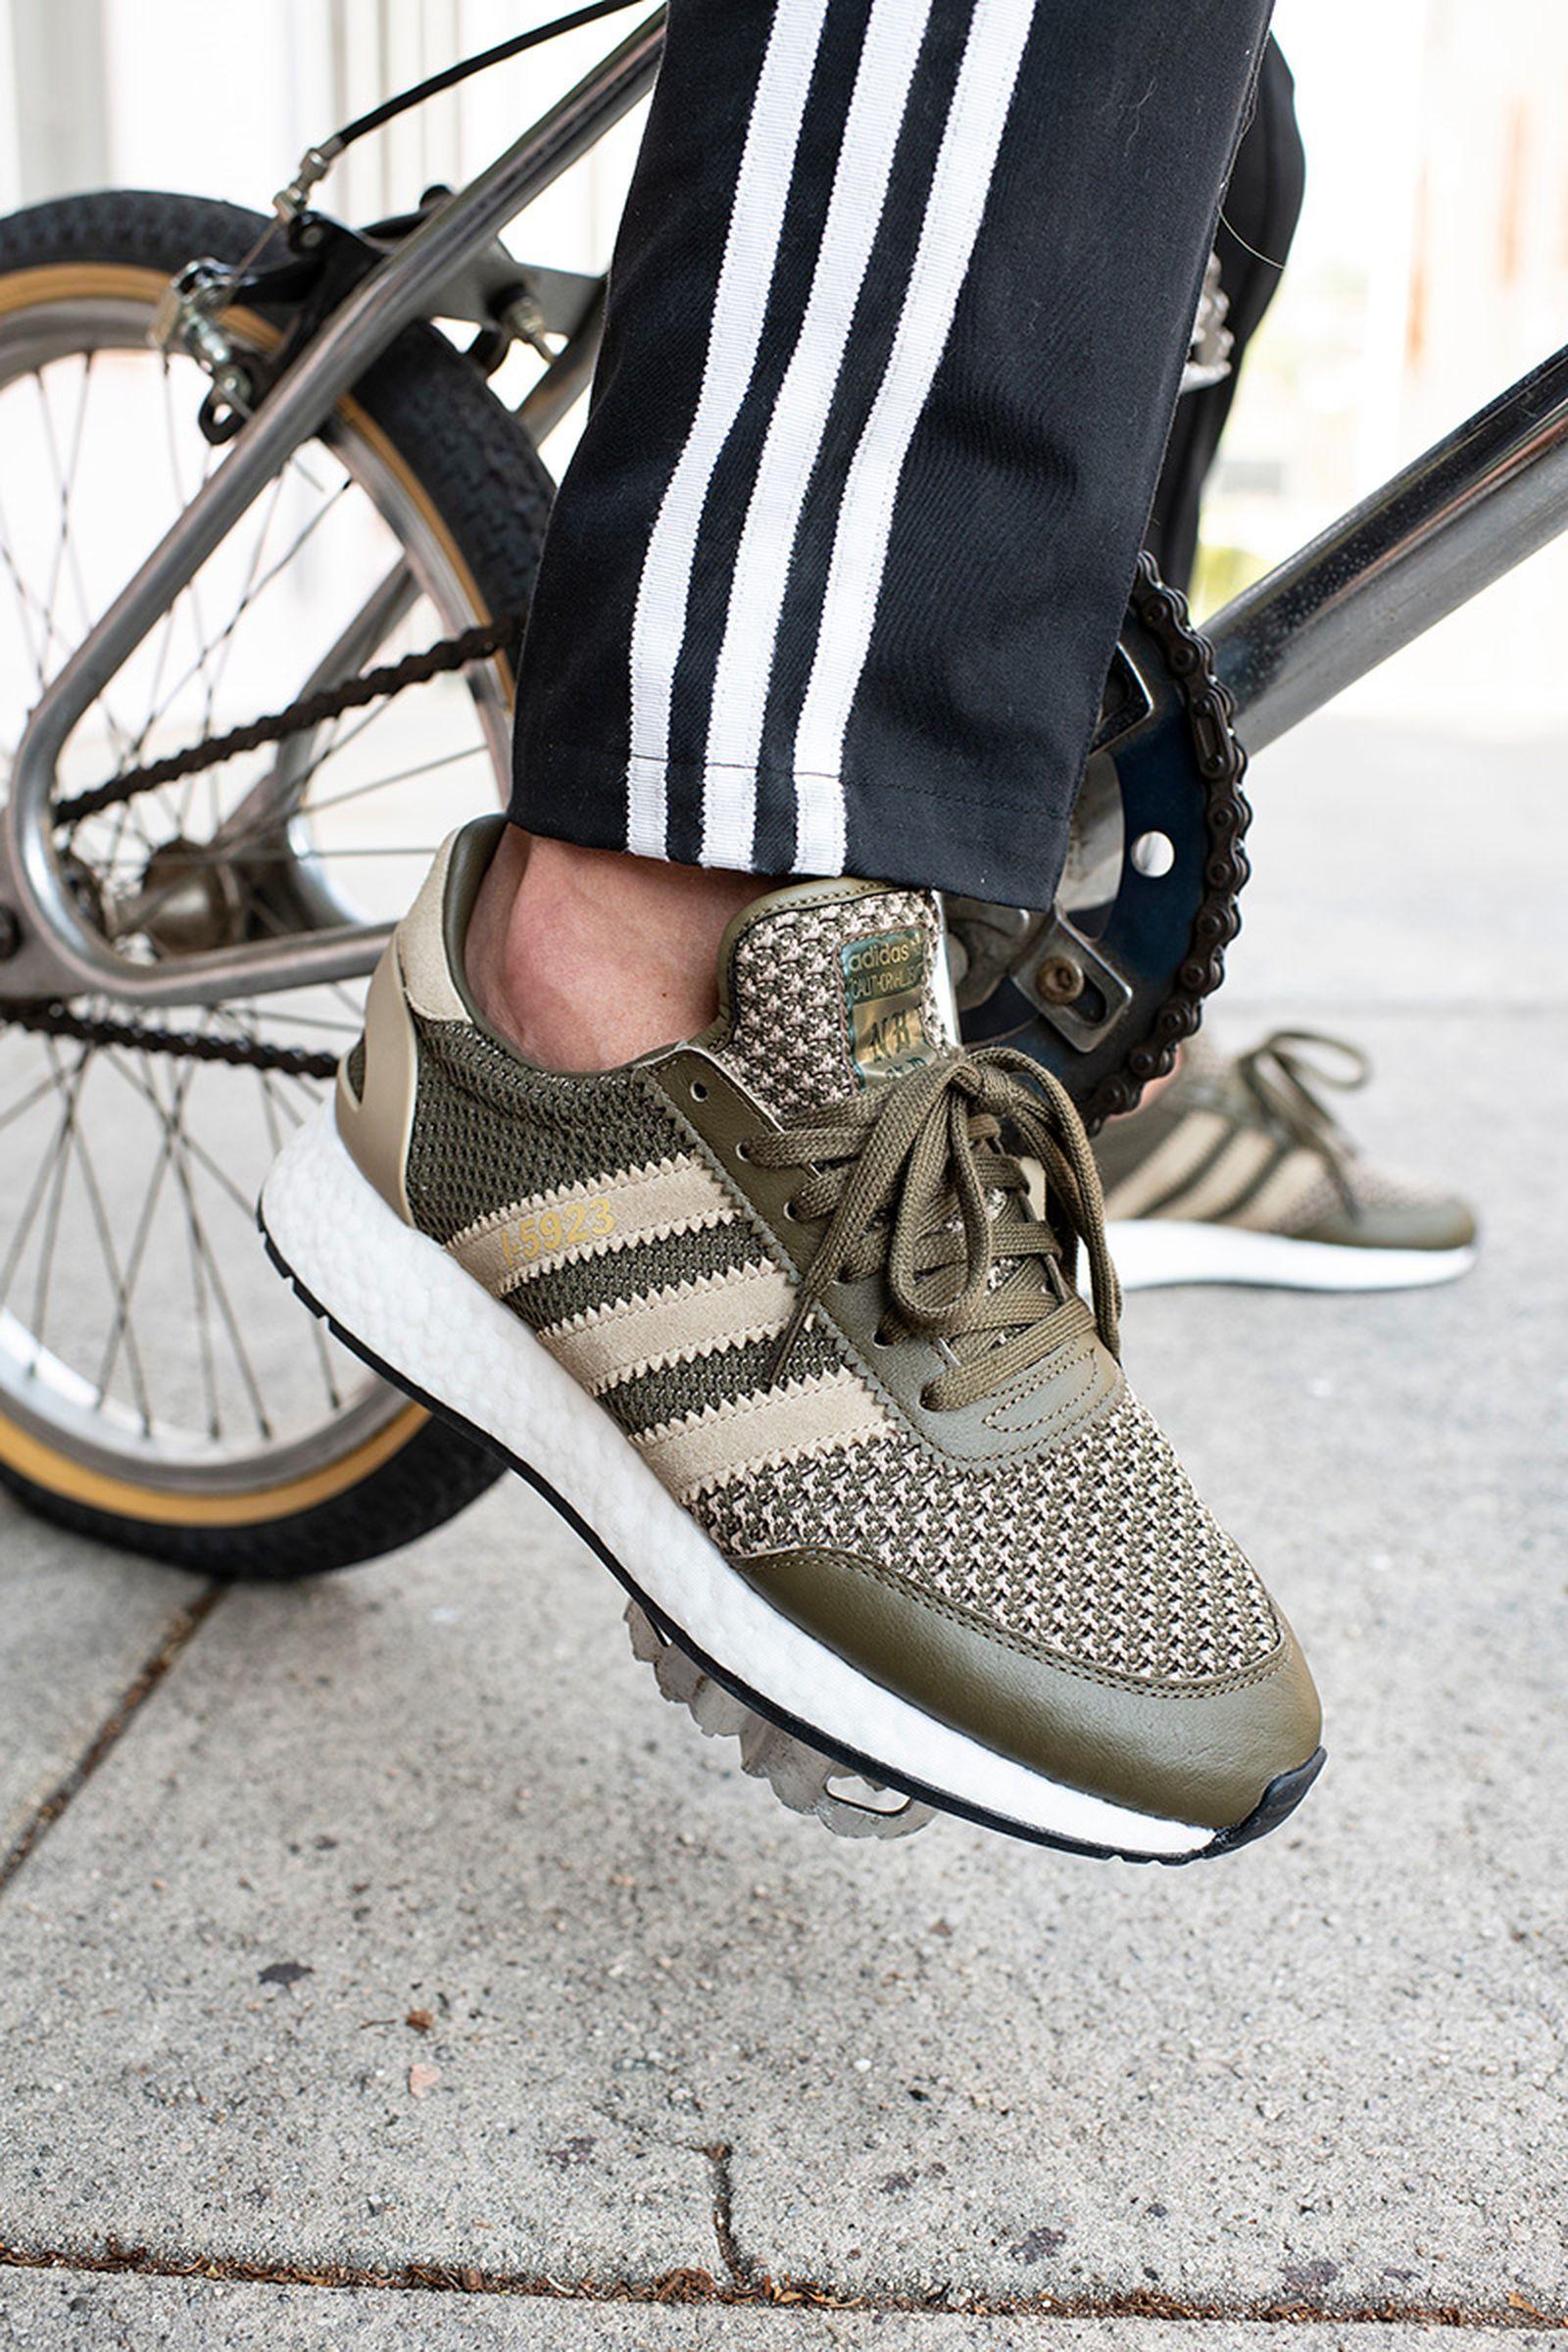 adidas neighborhood kamada release date price more info10